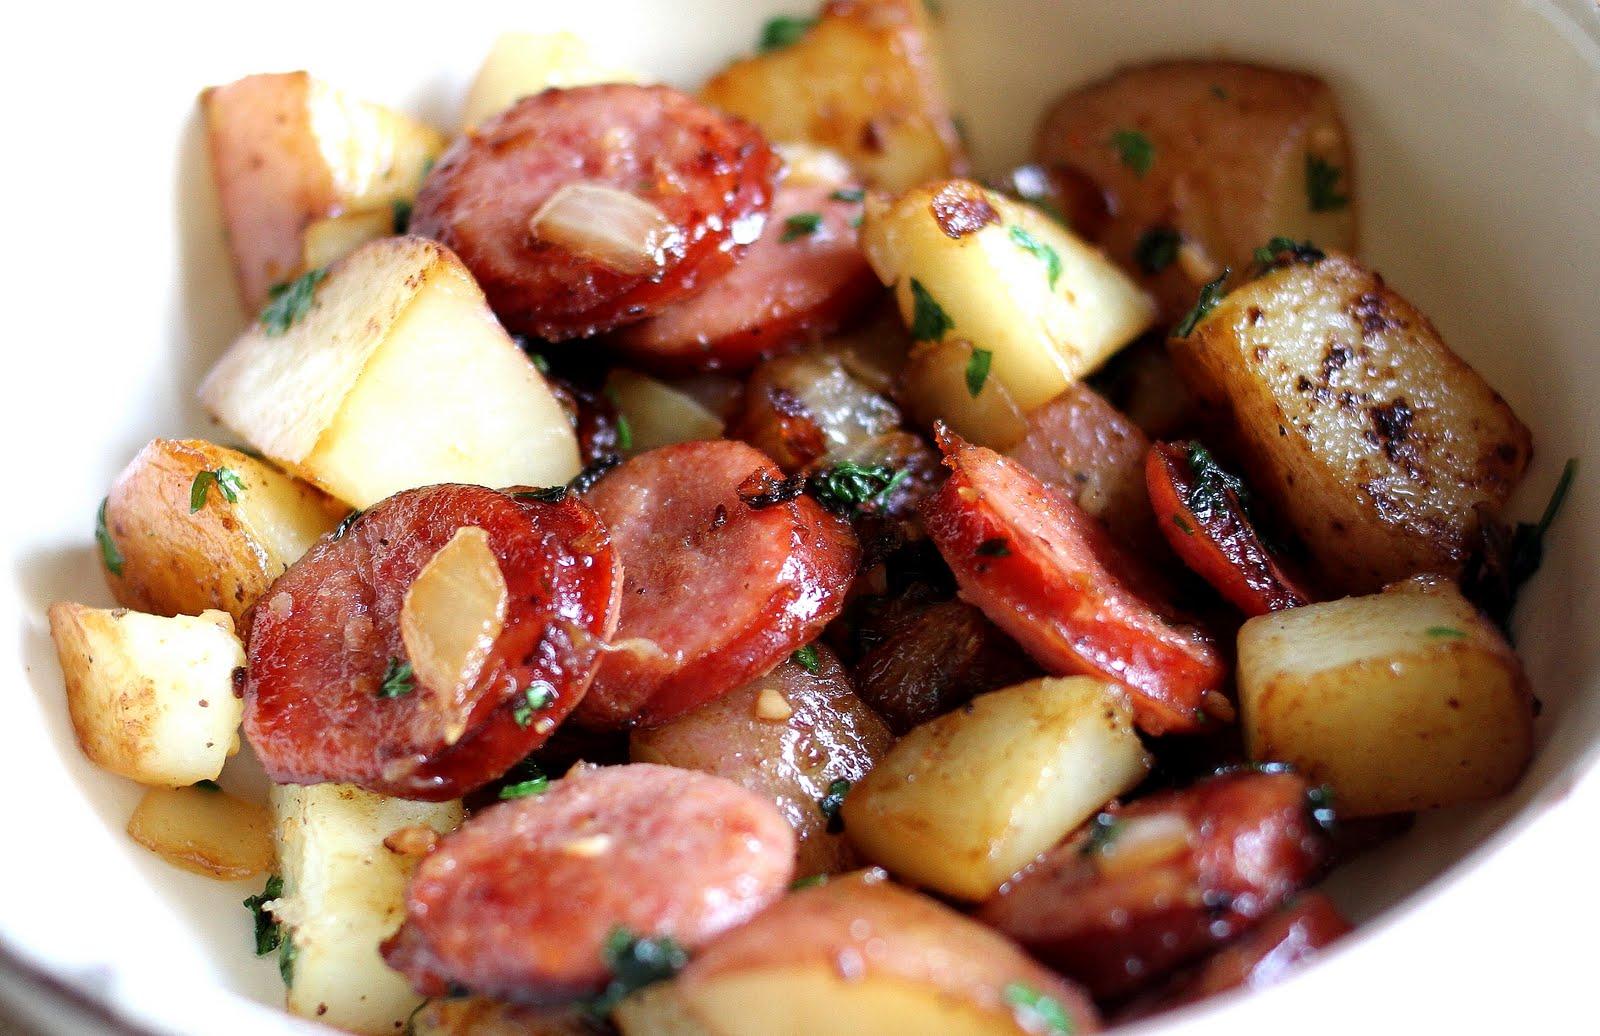 Колбаски с картошкой в домашних условиях рецепт